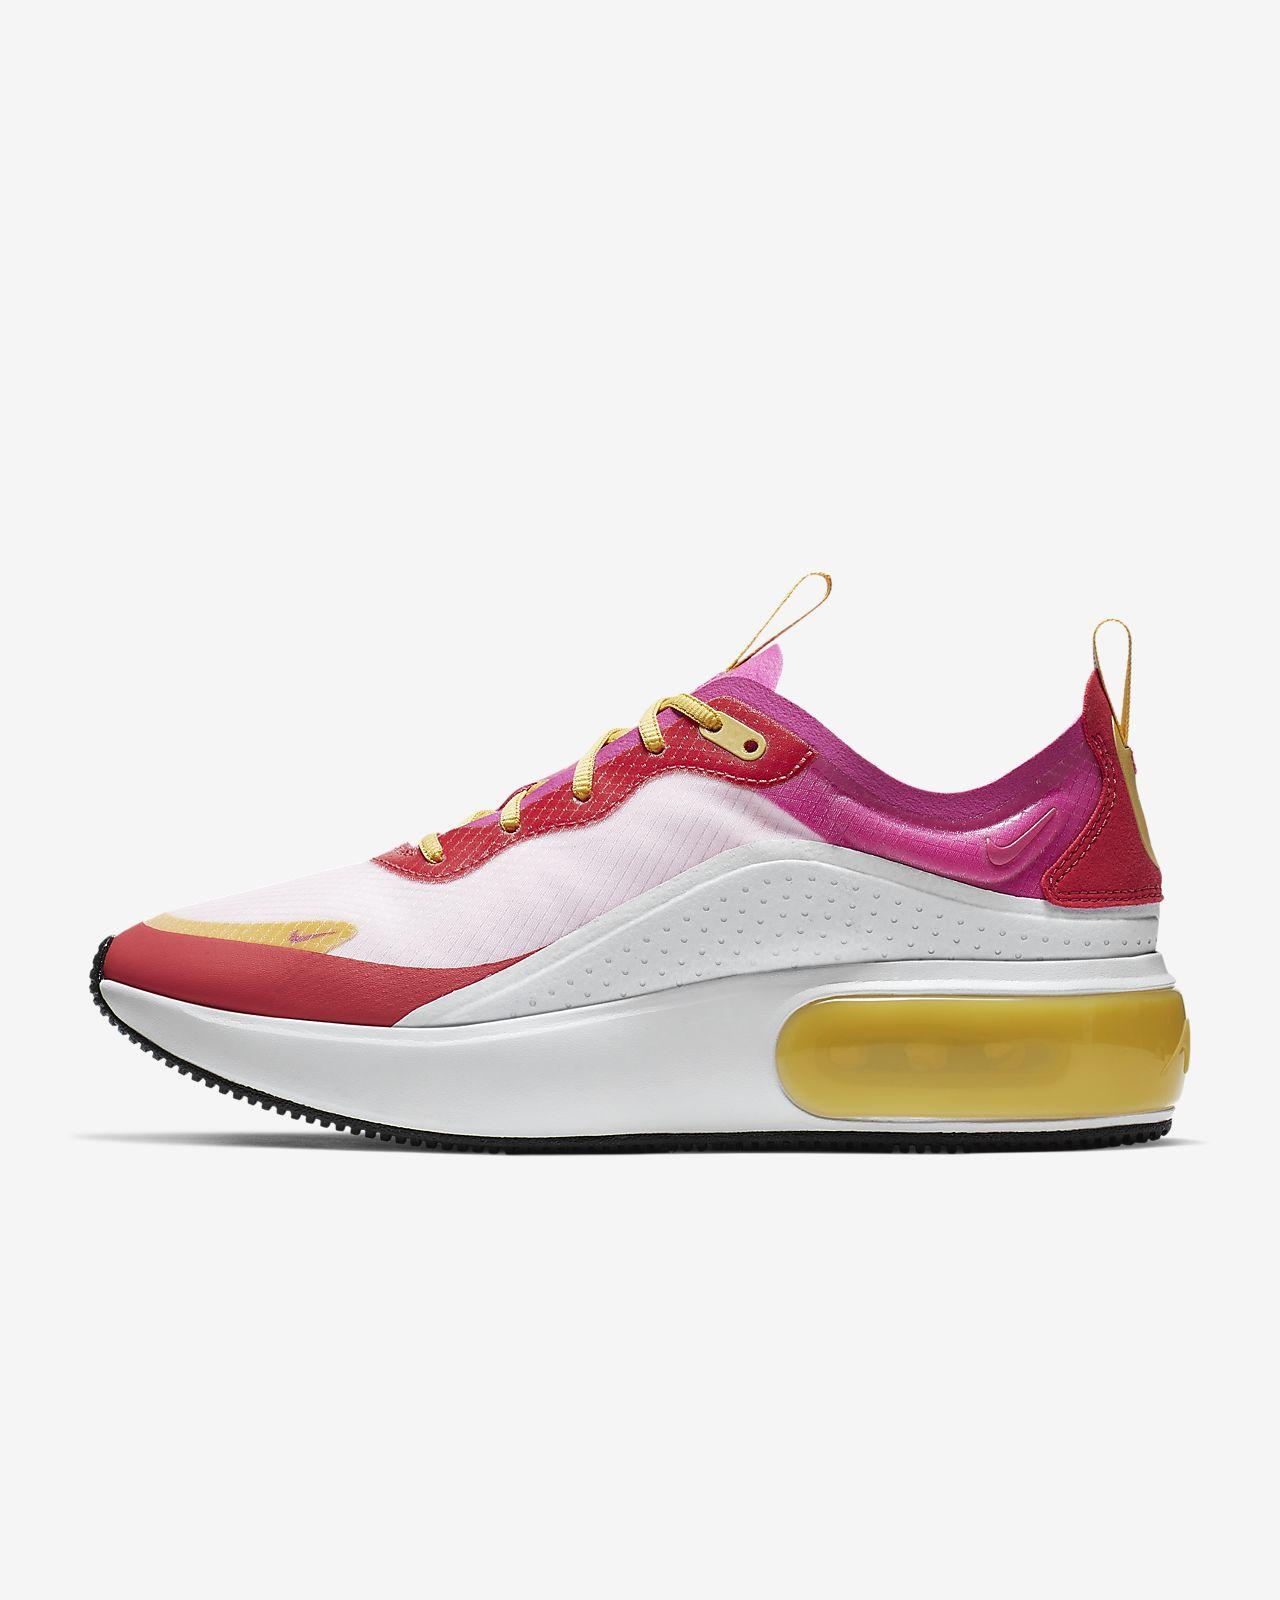 Nike Air Max Dia SE Shoe. Nike NZ